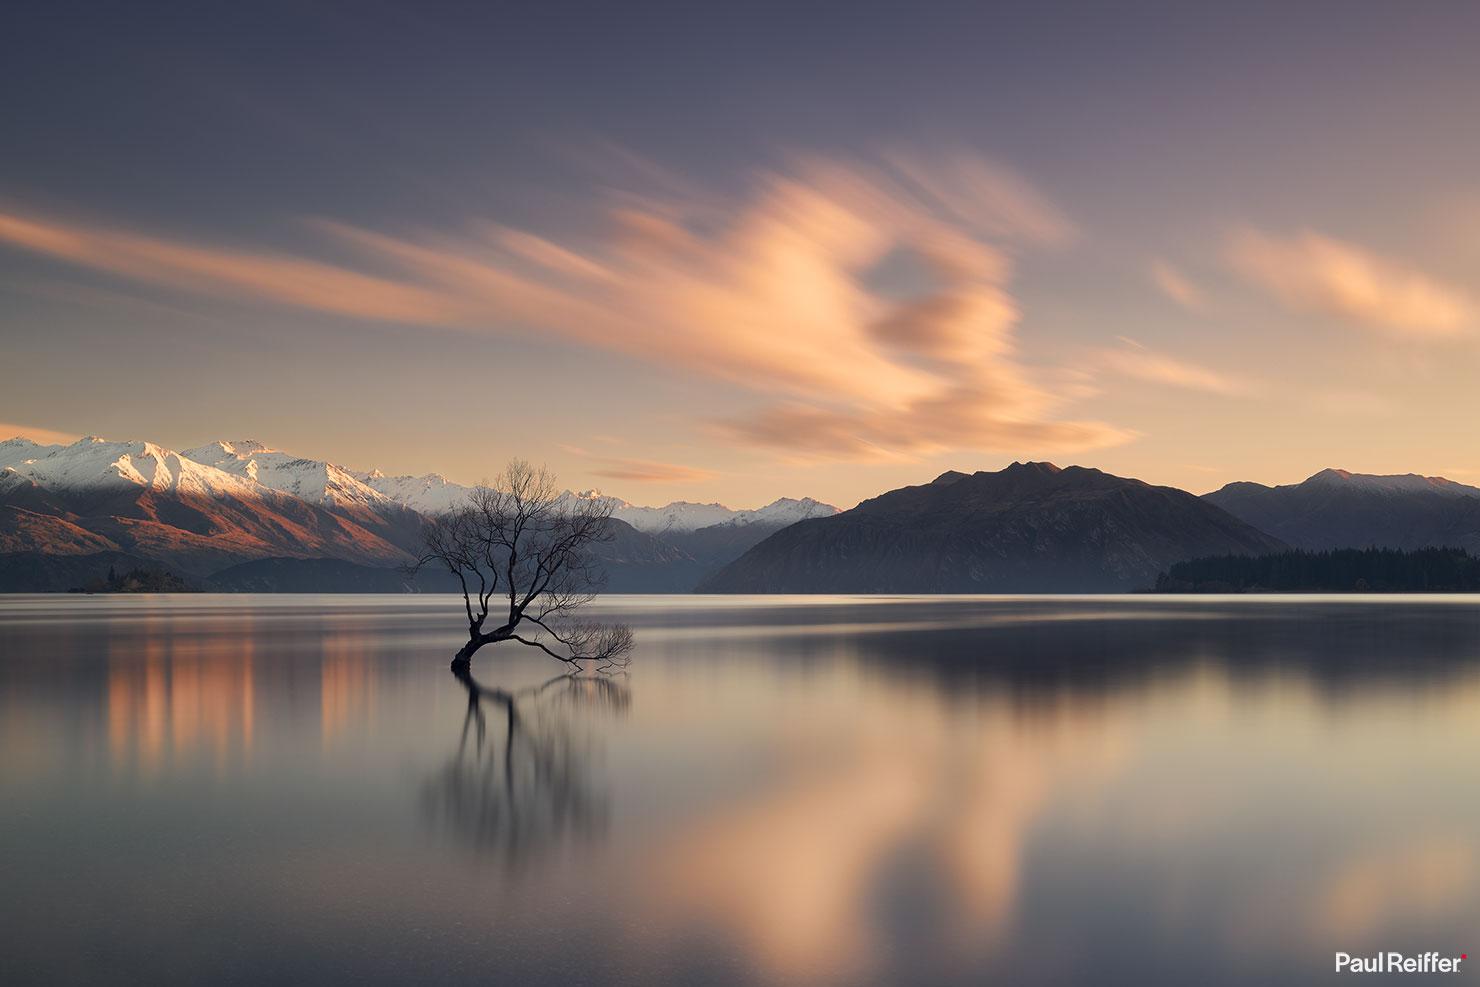 presence lake wanaka tree new zealand full wm paul reiffer fine art print